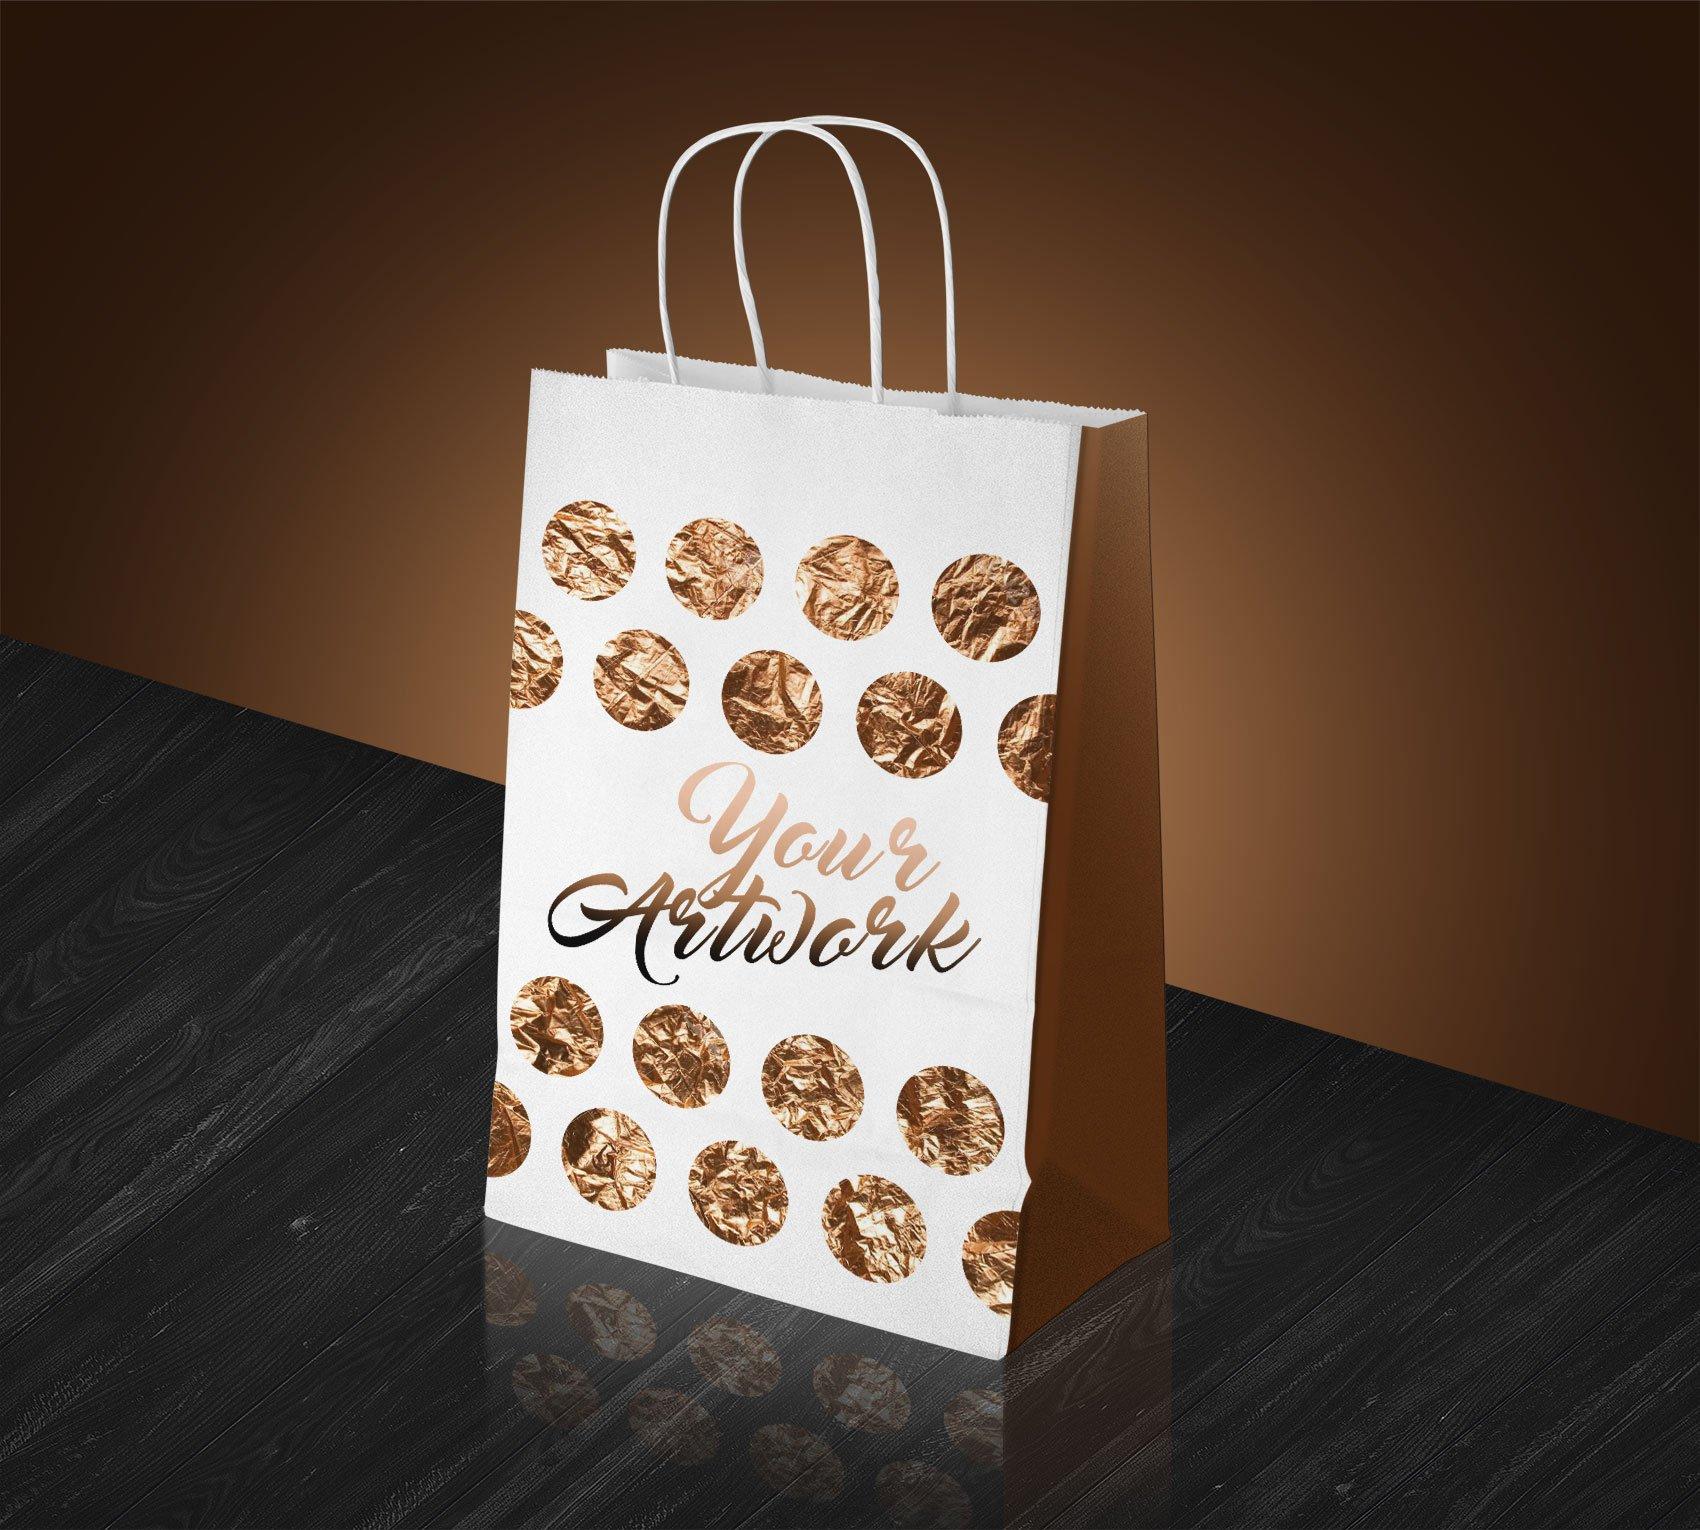 Free-White-Paper-Shopping-bag-Mockup-PSD